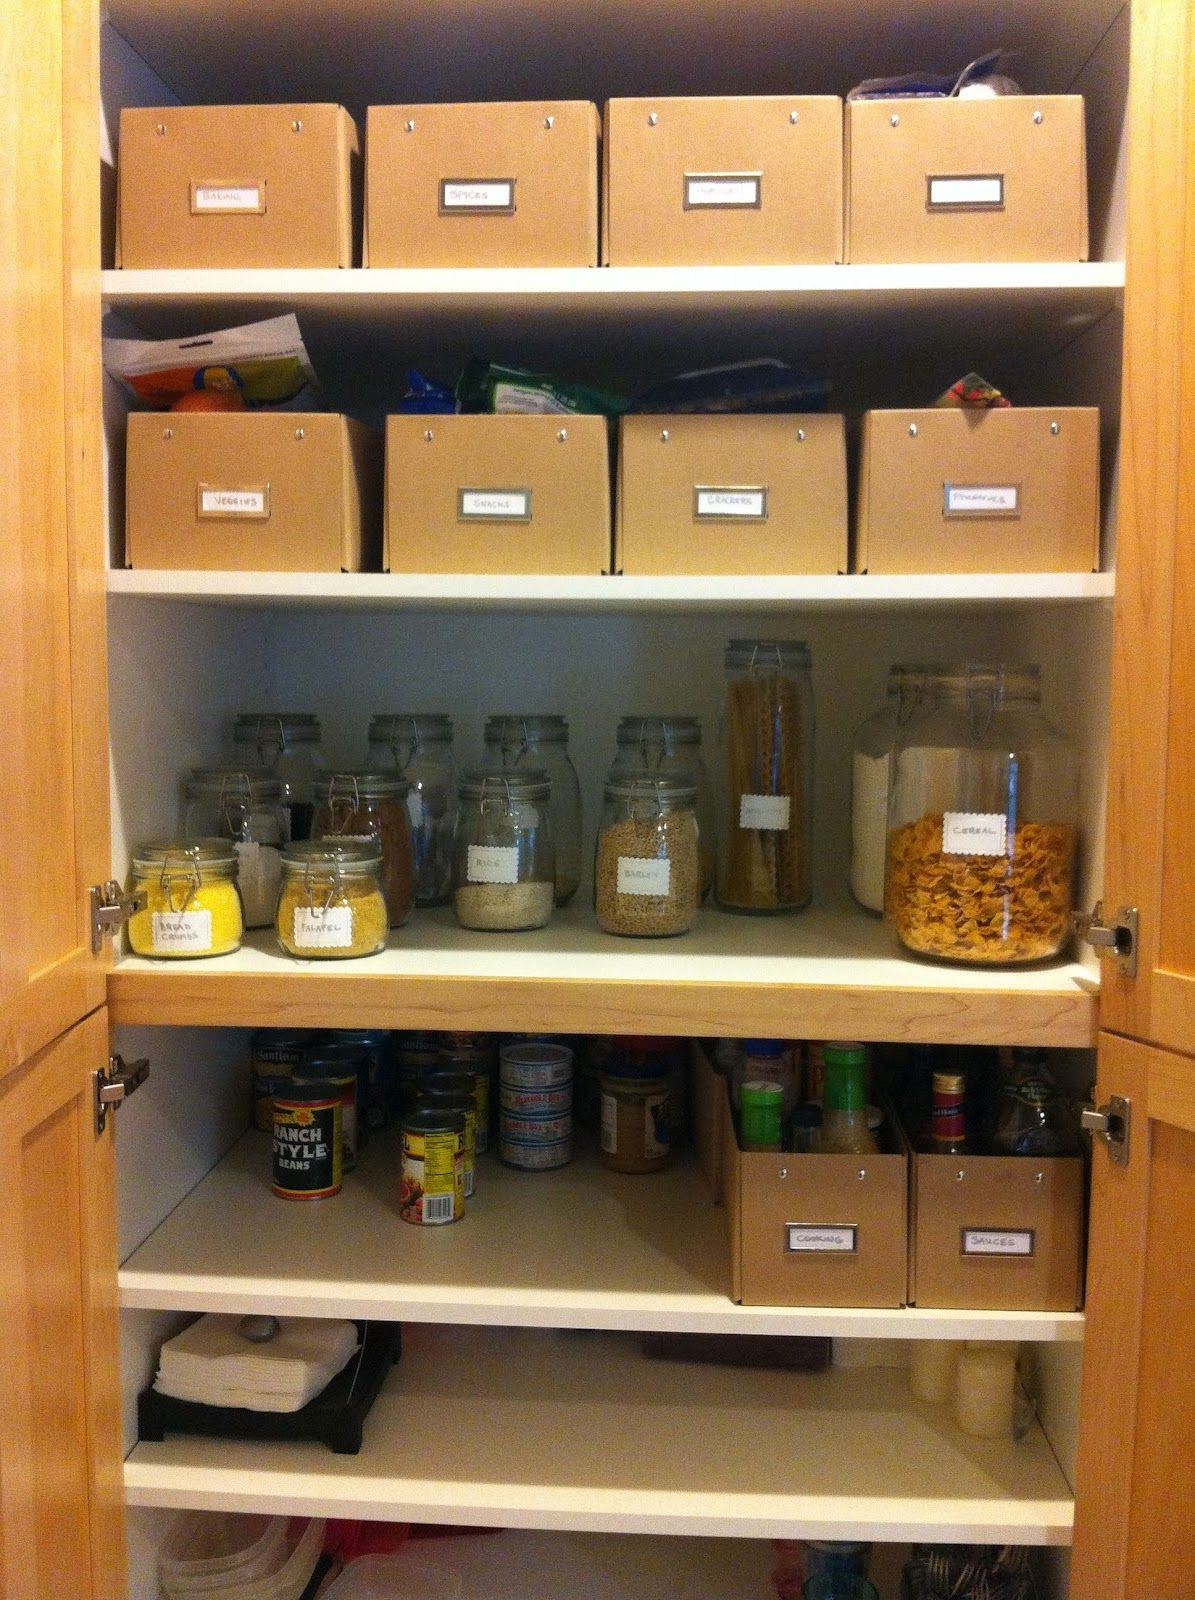 diy organization ideas home decor diy ideas organizing grocery cabinets westbro on kitchen decor organization id=70615